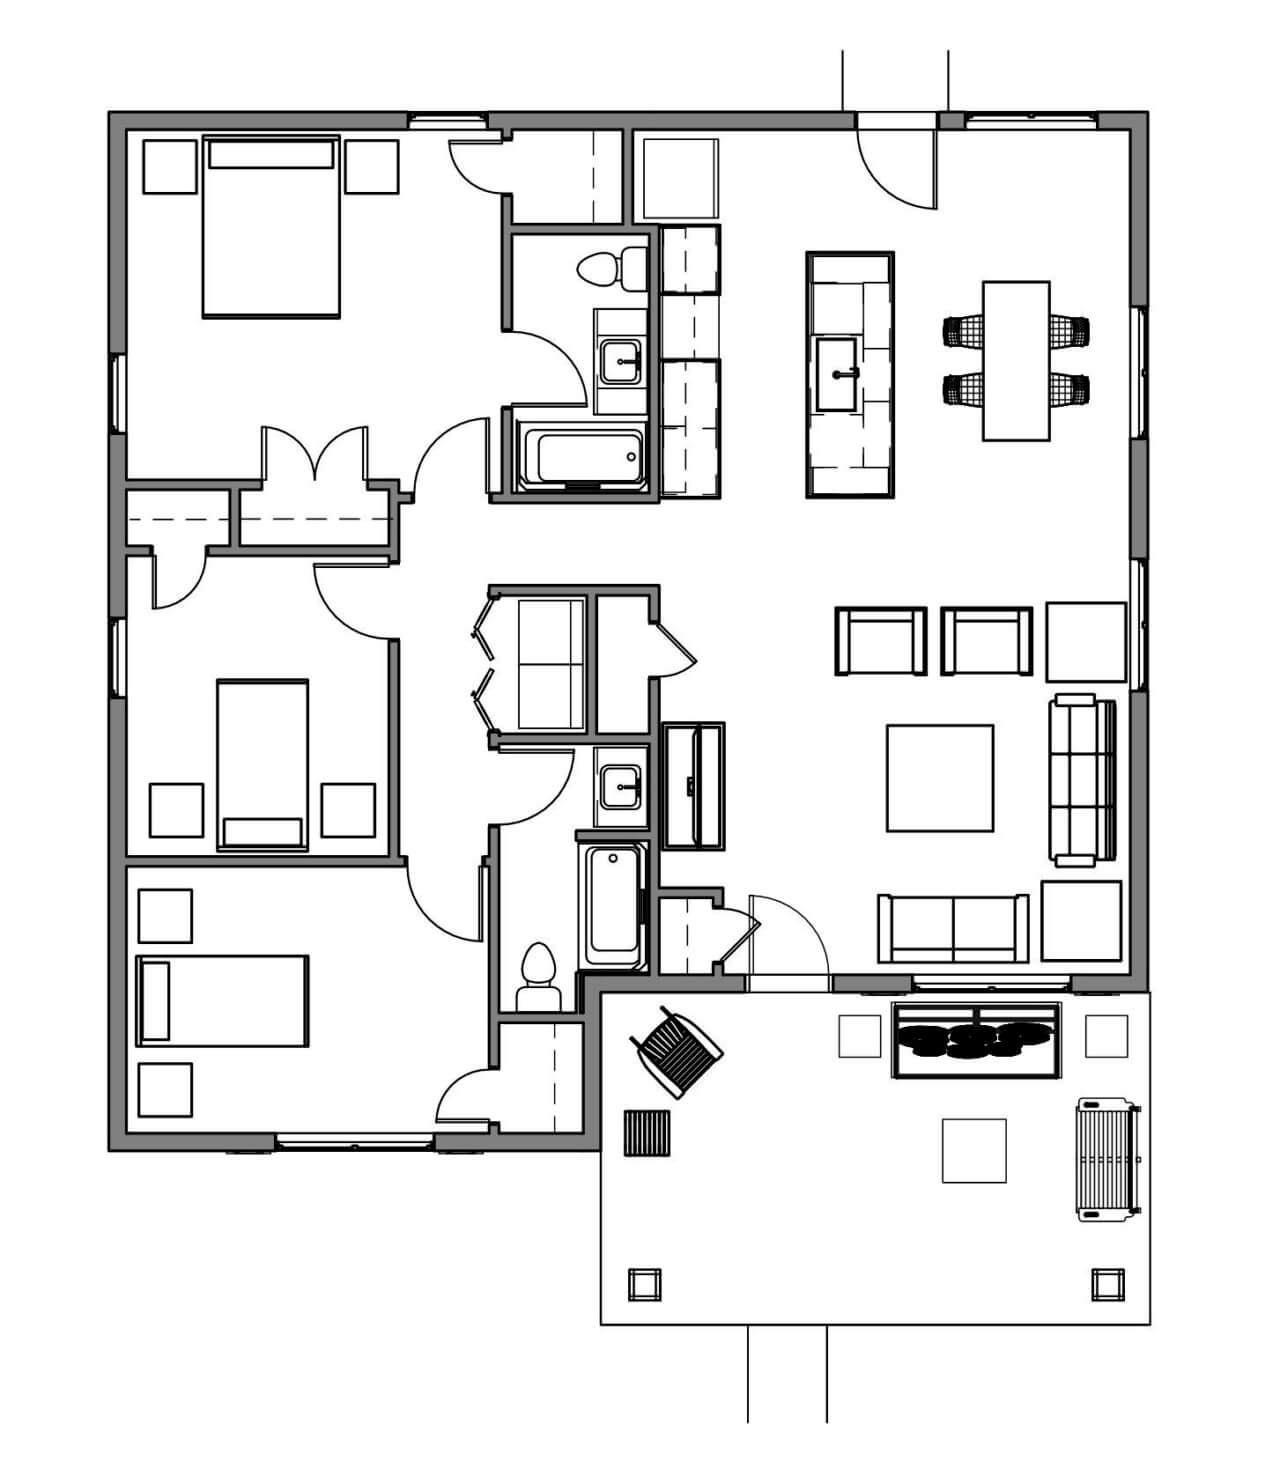 floor plan illustration of a home